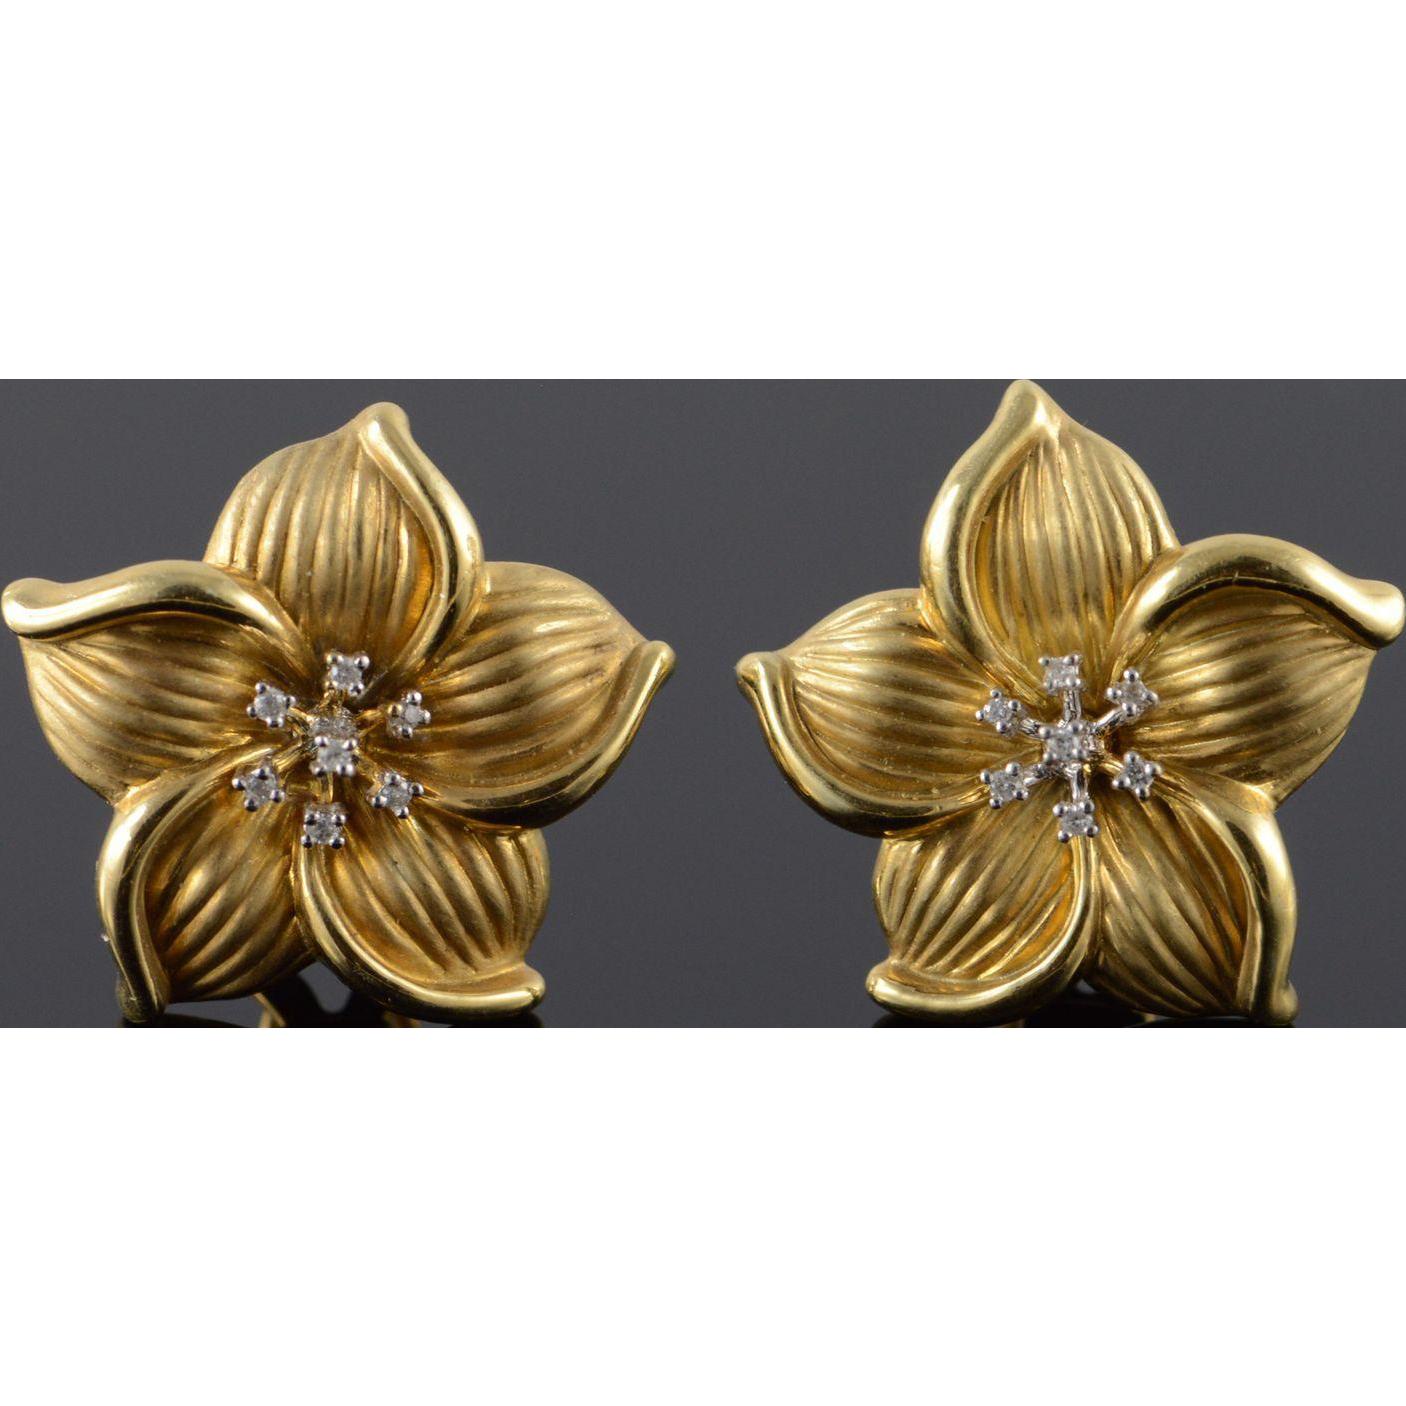 14K 0.10 CTW Diamond Fancy Detailed Flower French Clip Earrings Yellow Gold